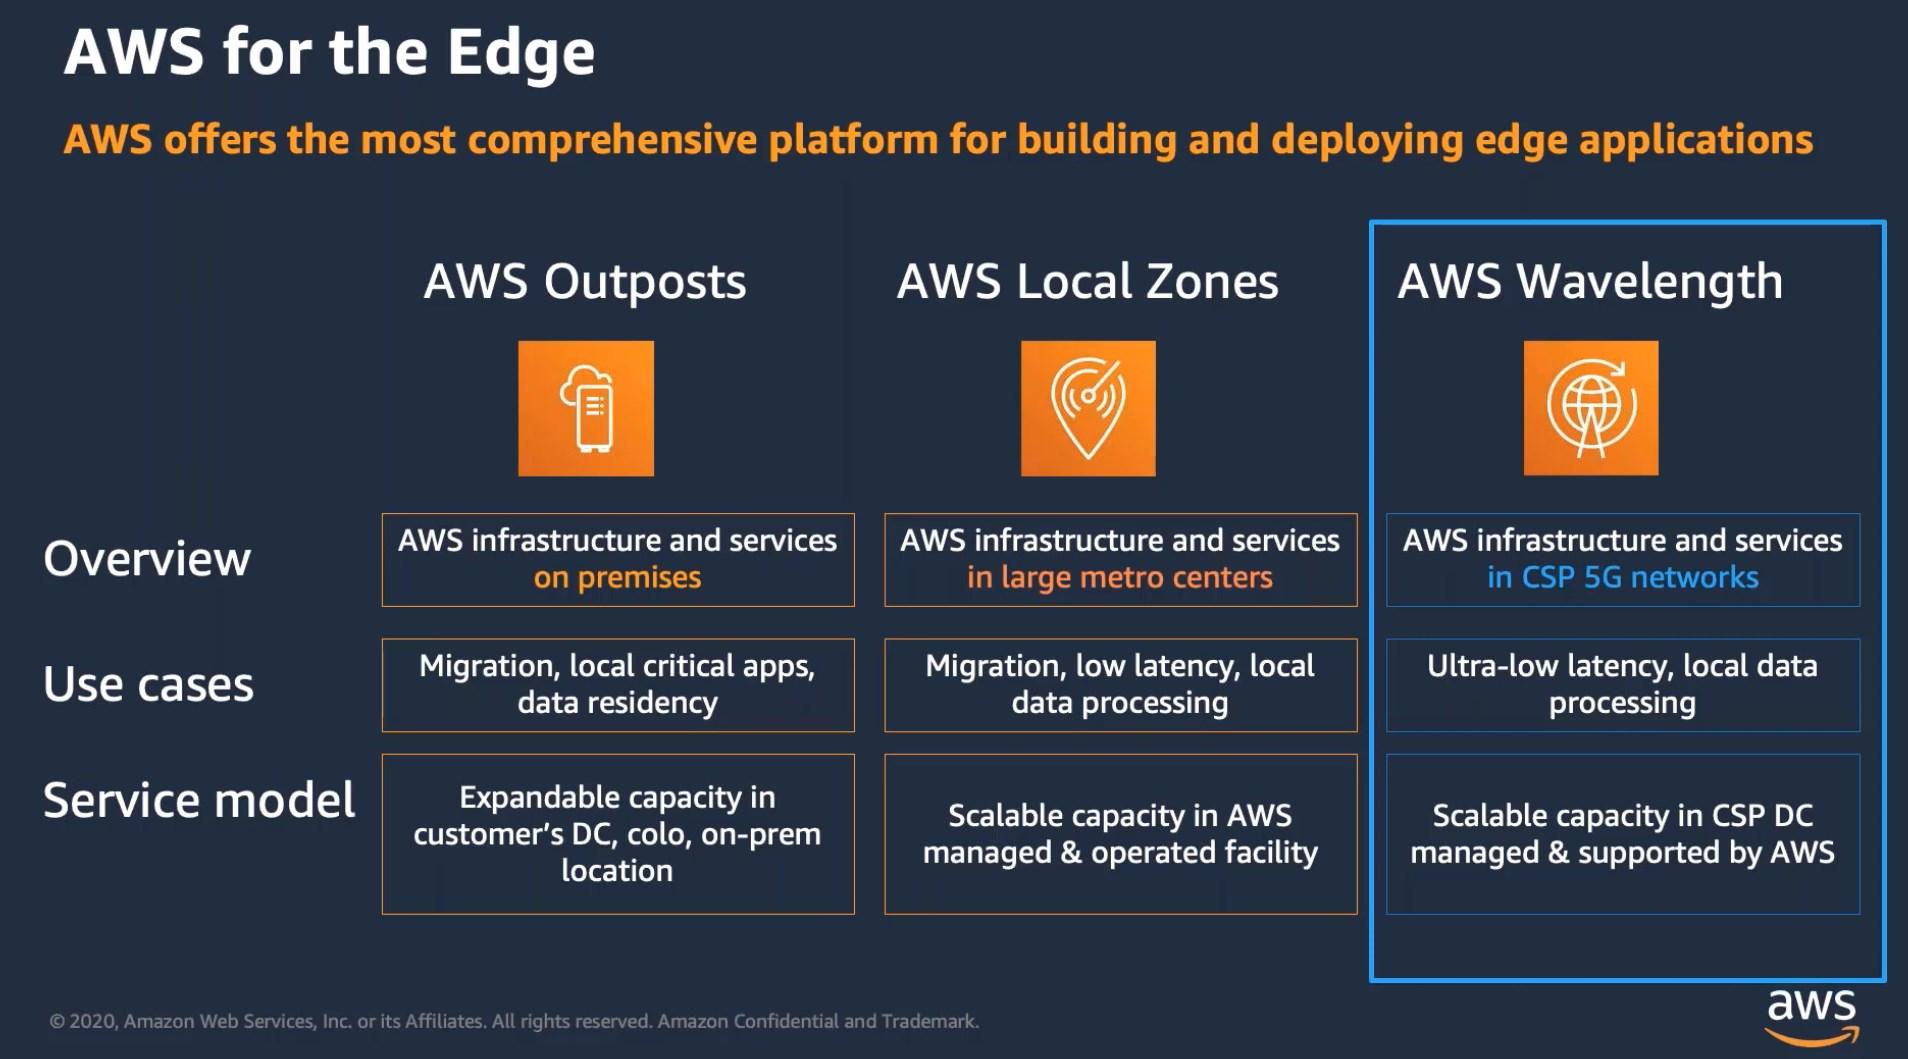 The three AWS edge computing platforms detailed.